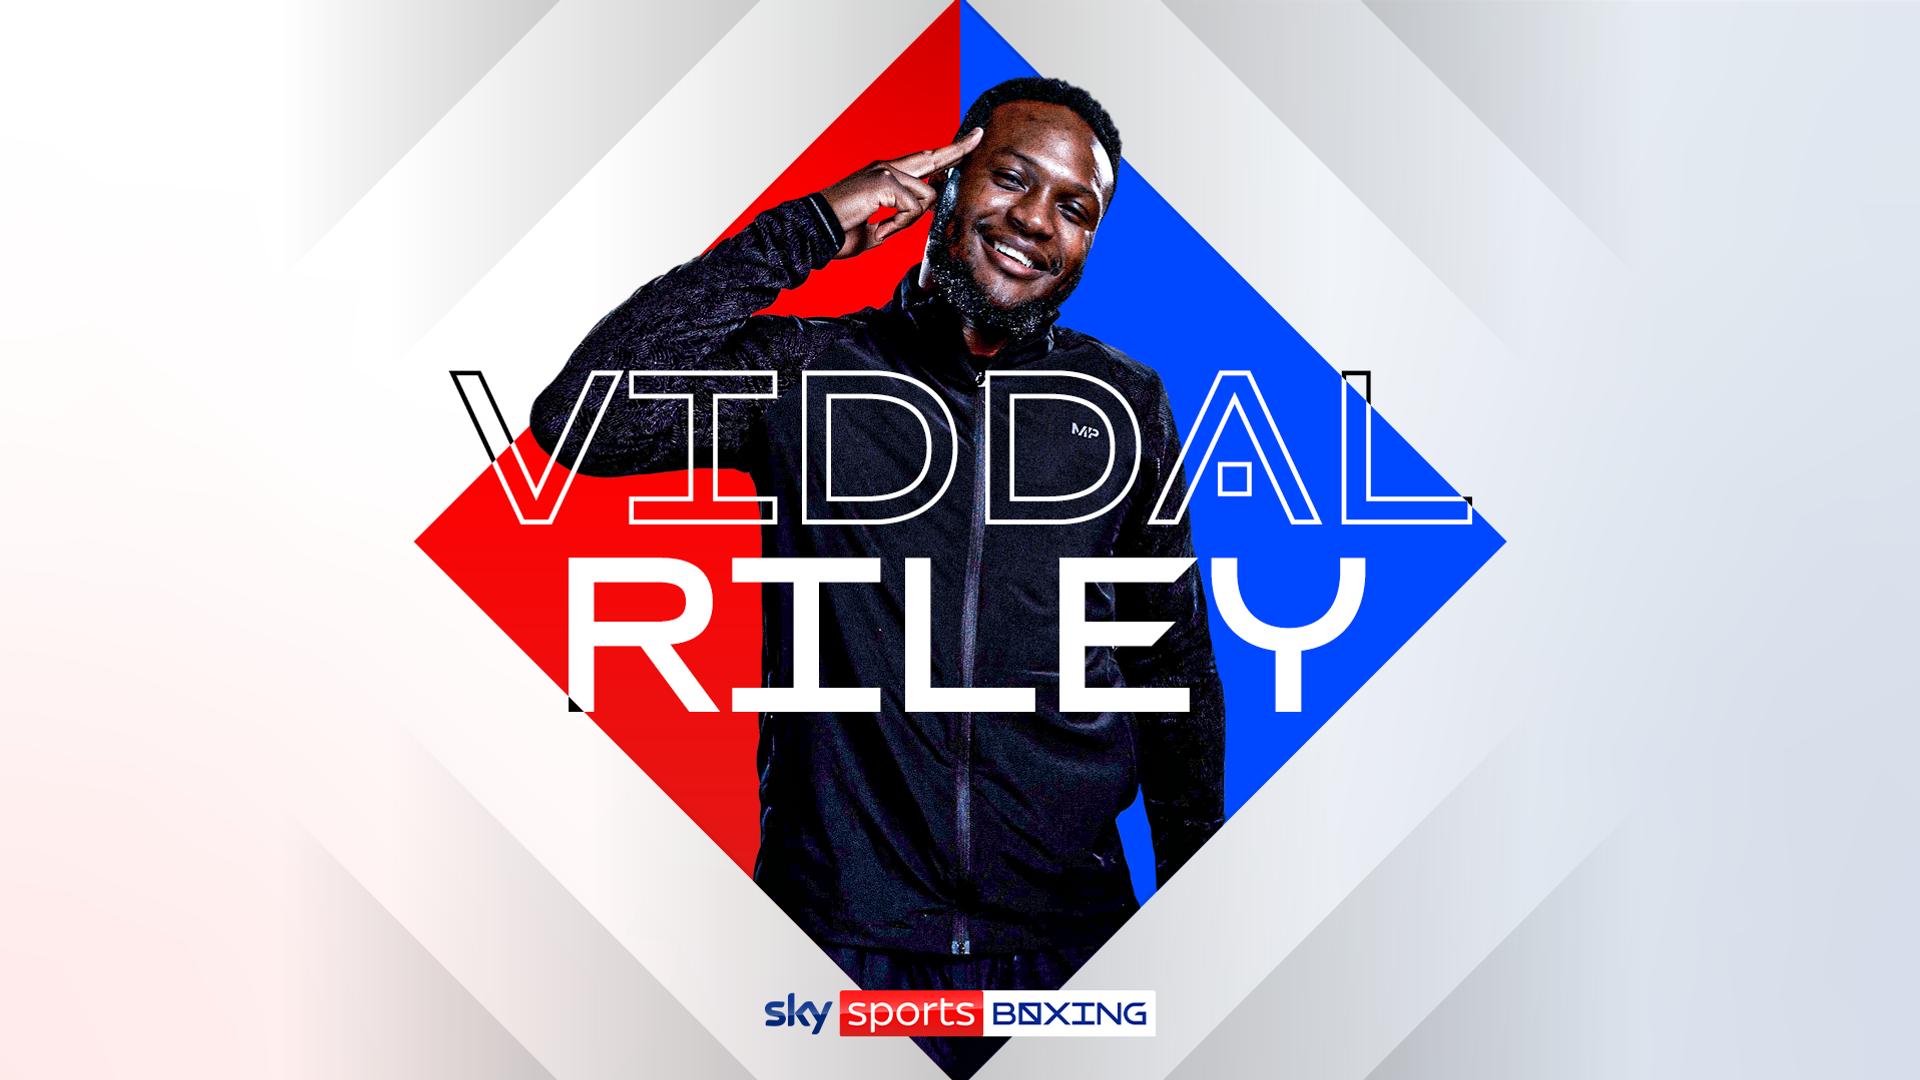 Viddal Riley's ringside watchalong tonight!